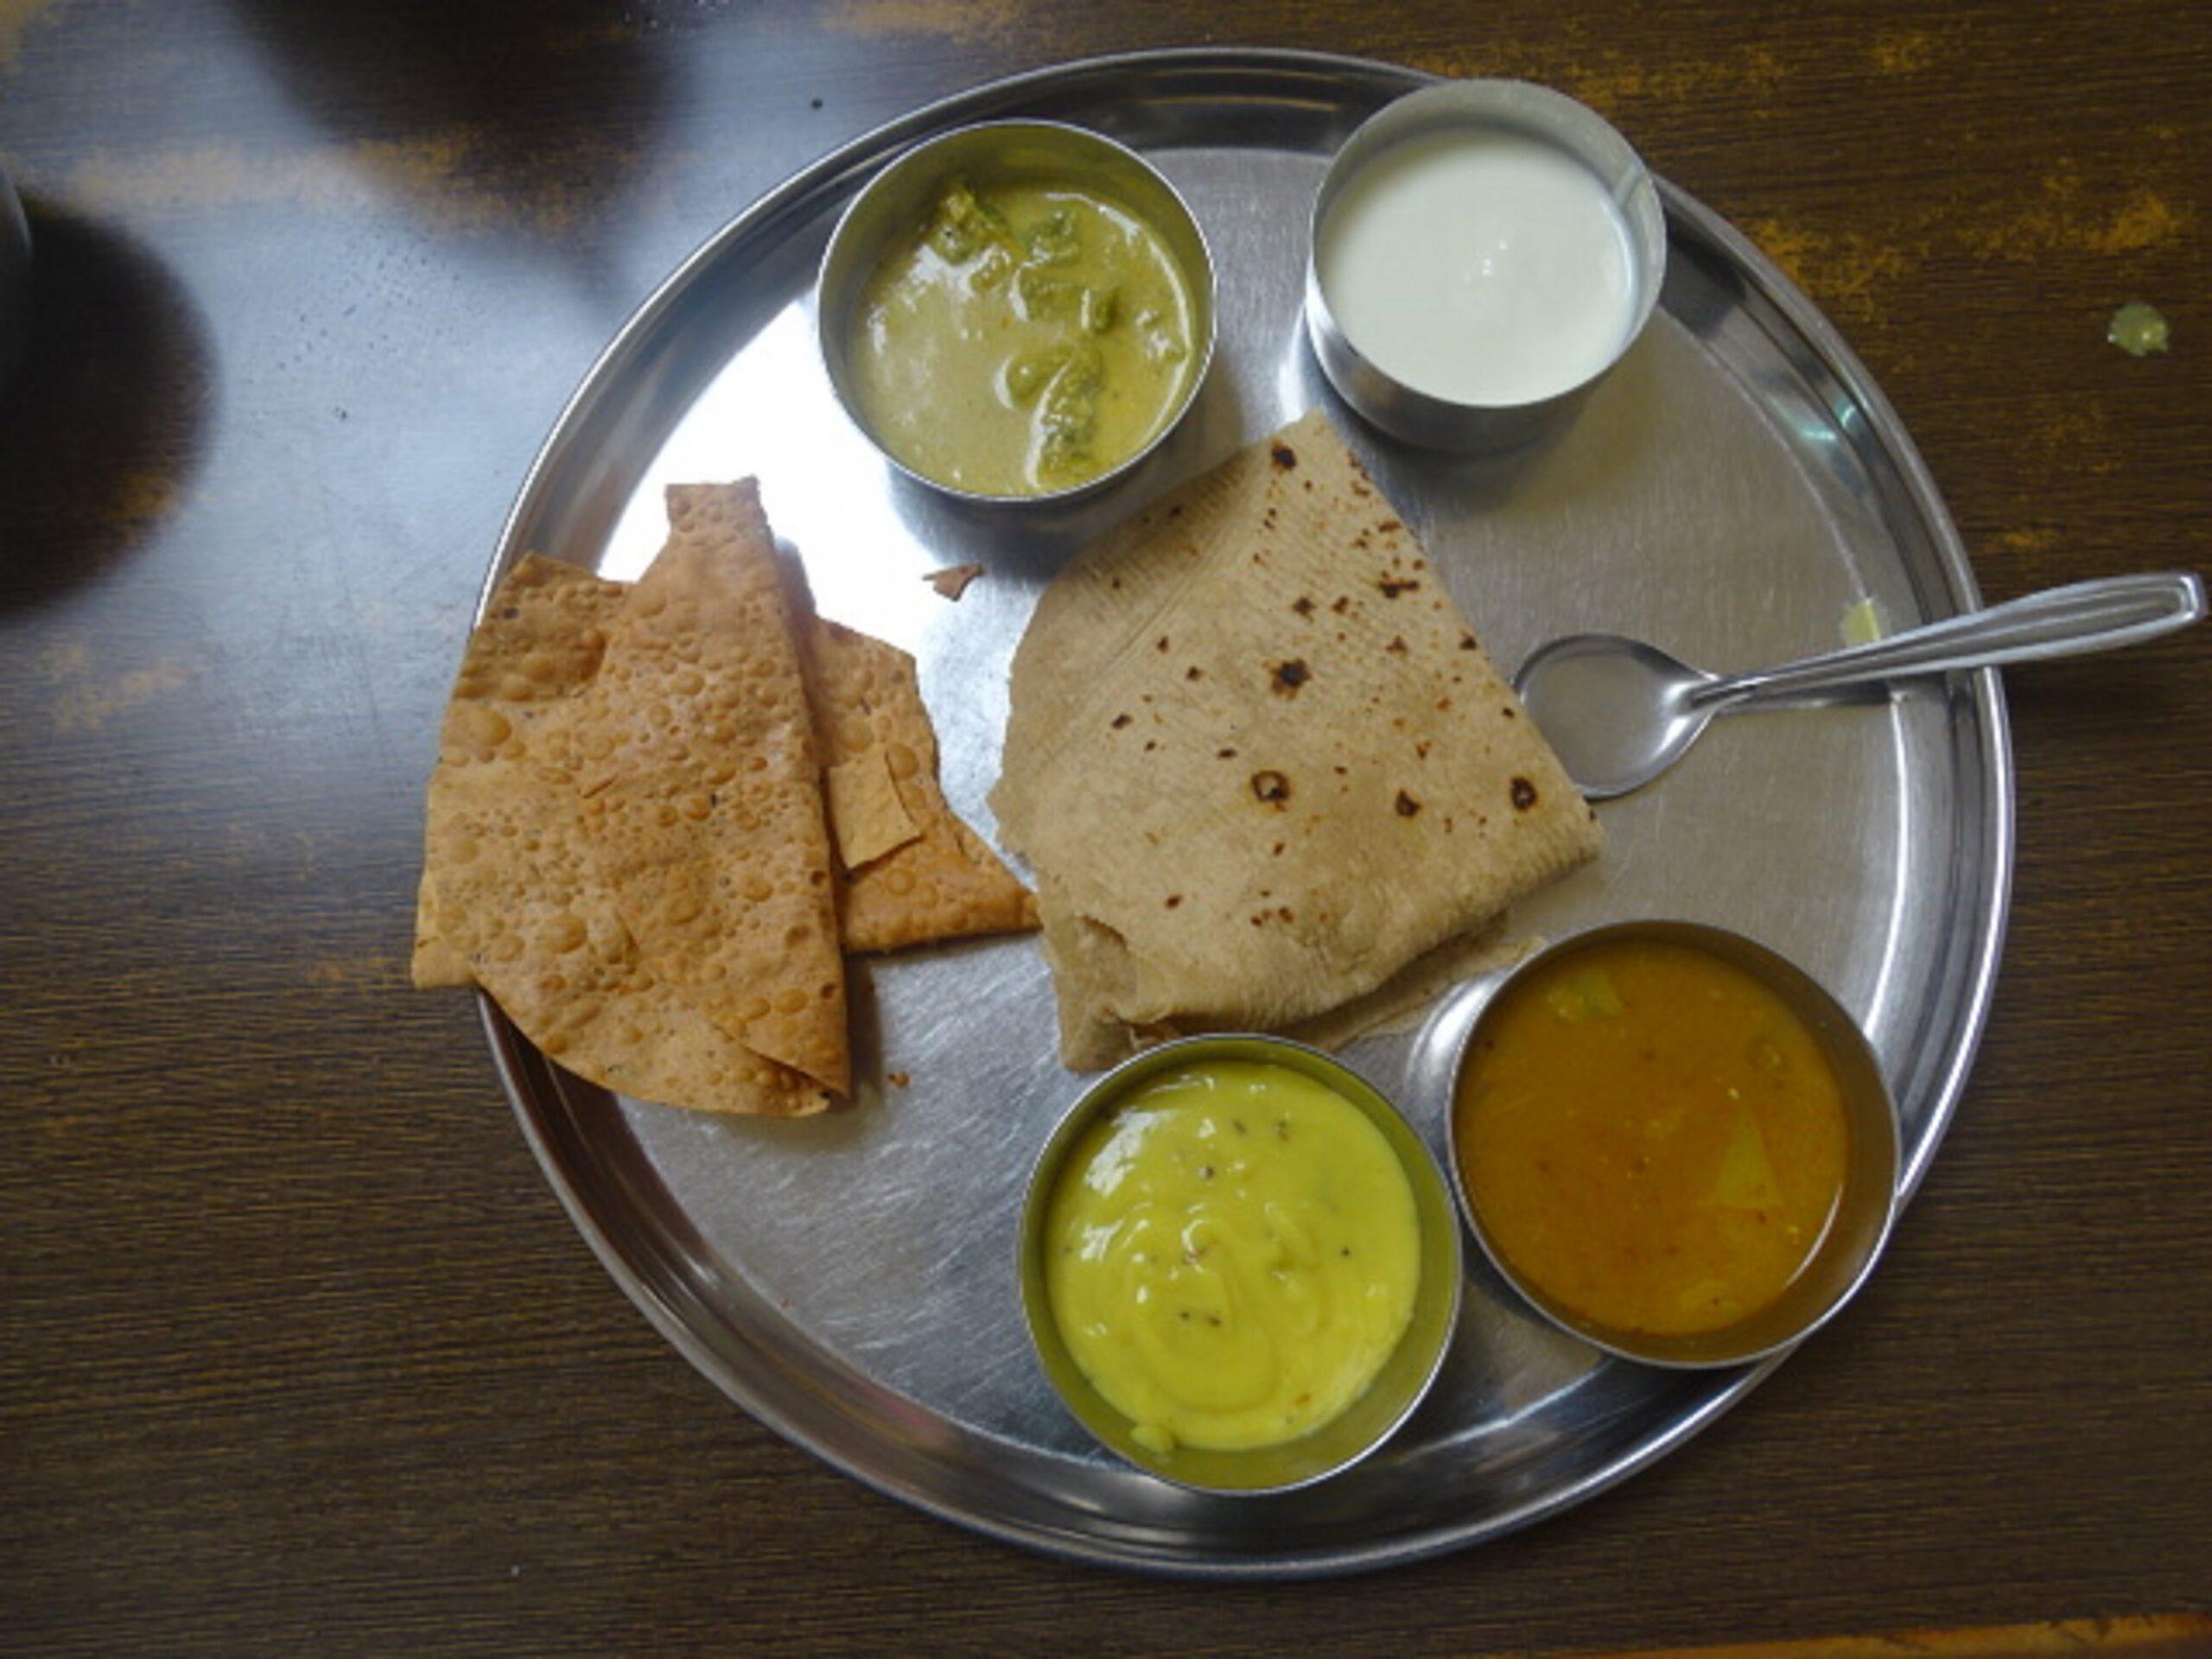 Paid Prasad Meal at Shree Sai Prasadalay in Shirdi, Maharashtra, India